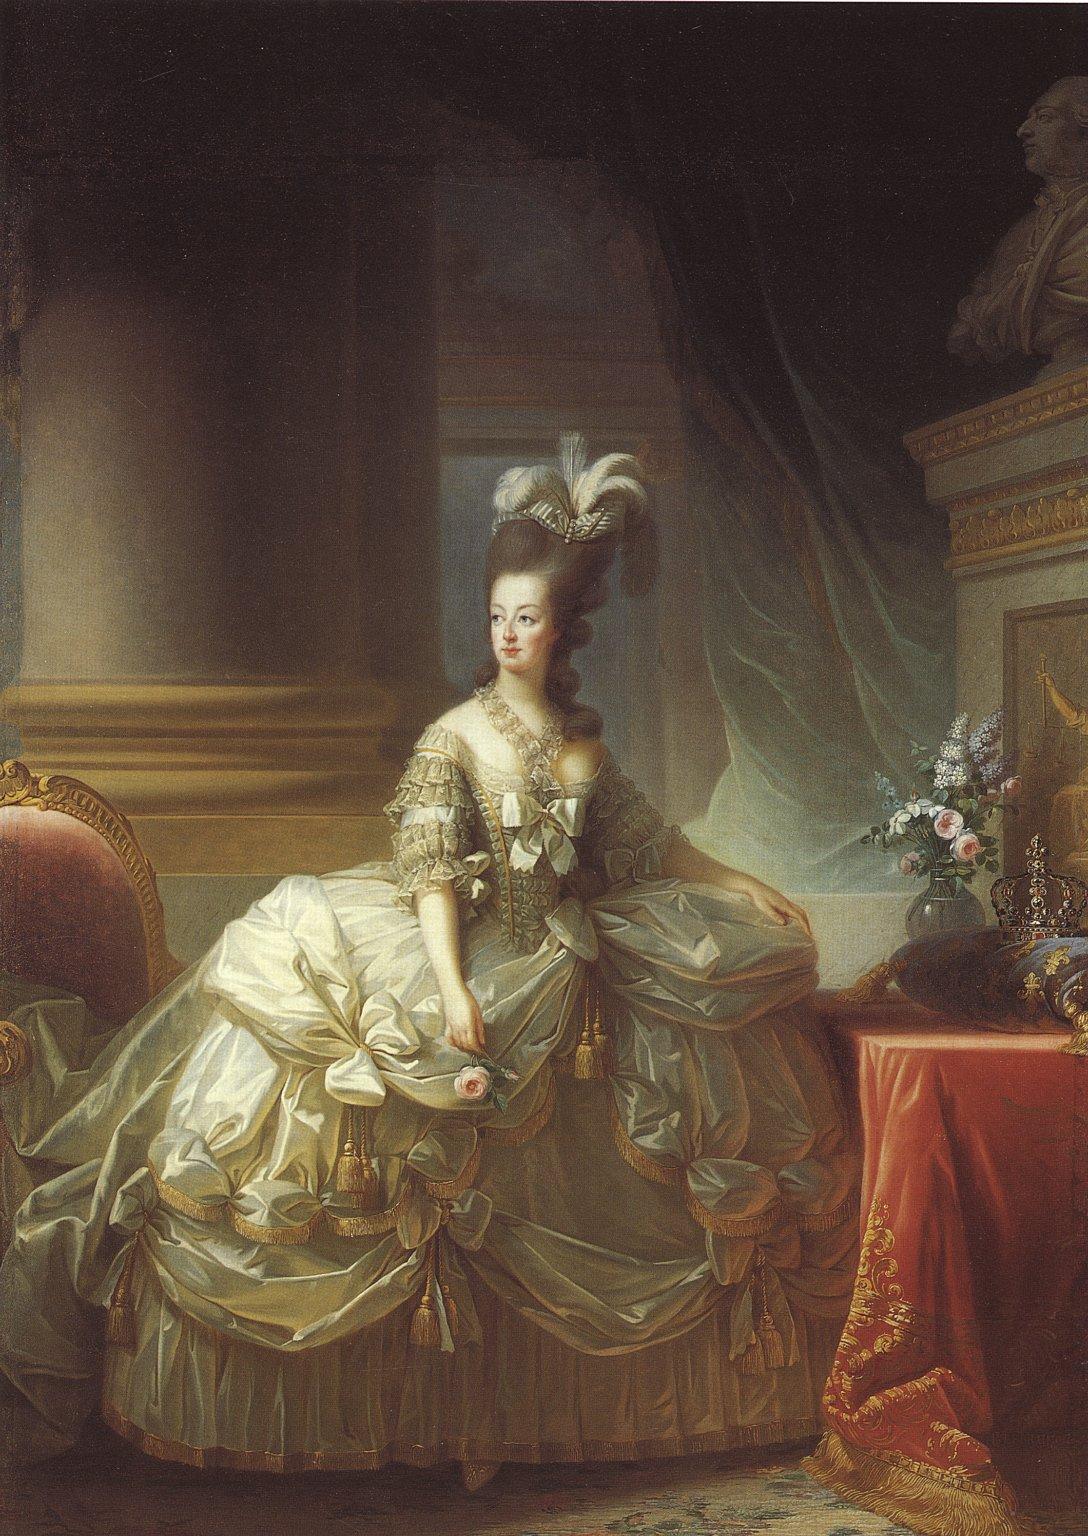 Elisabeth Vigée Lebrun, Marie Antoinette, 1778, oil on canvas, Kunsthistoriches Museum